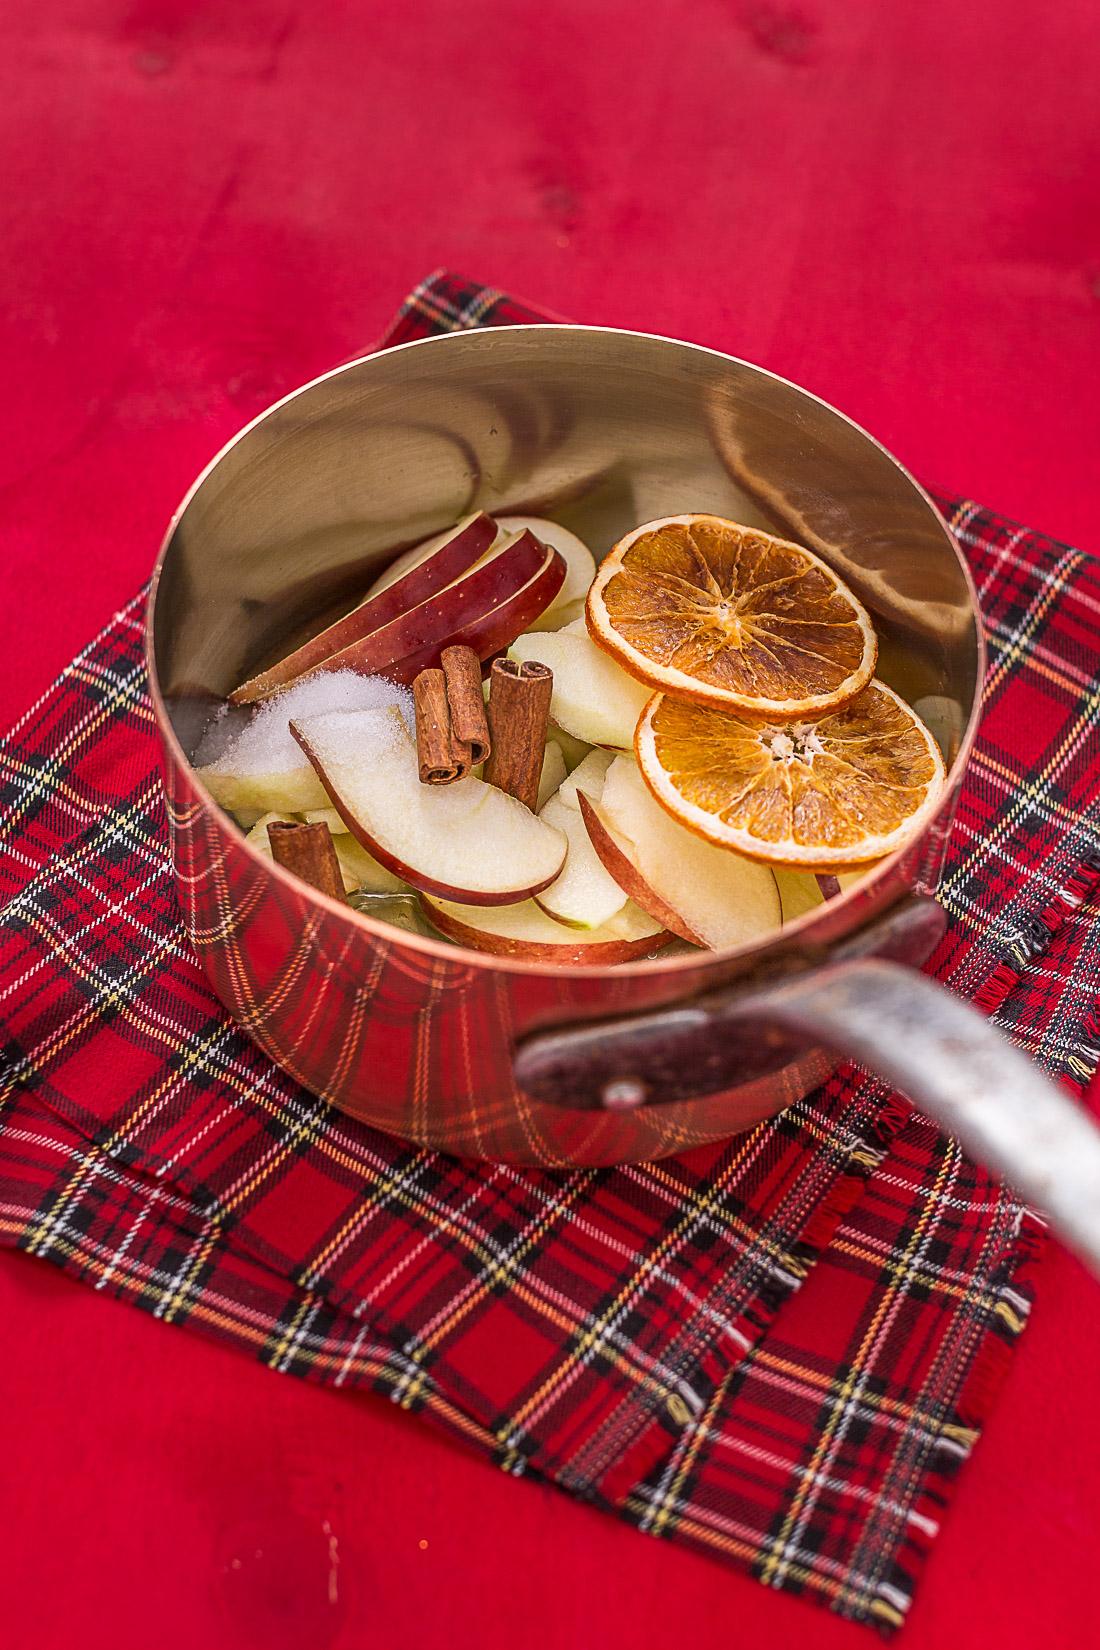 pancakes integrali alla cannella e mele caramellate senza uova senza burro senza zucchero - #vegan apple cinnamon wholemeal pancakes